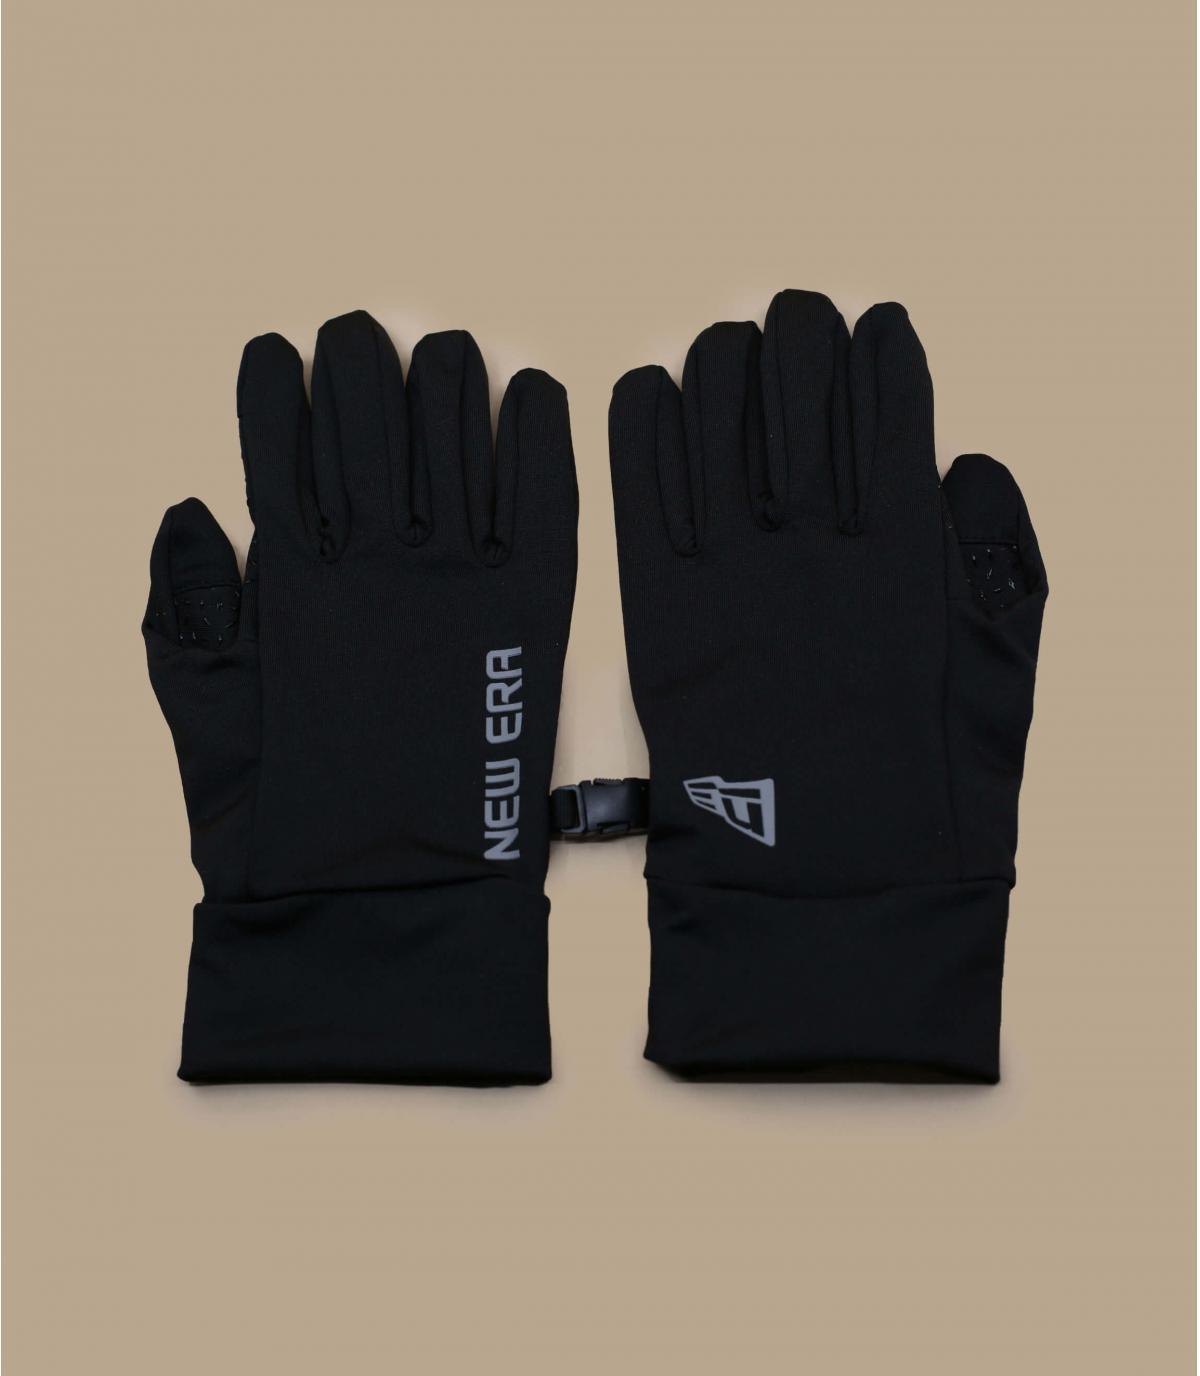 Détails Electronic Touch Gloves black - image 2